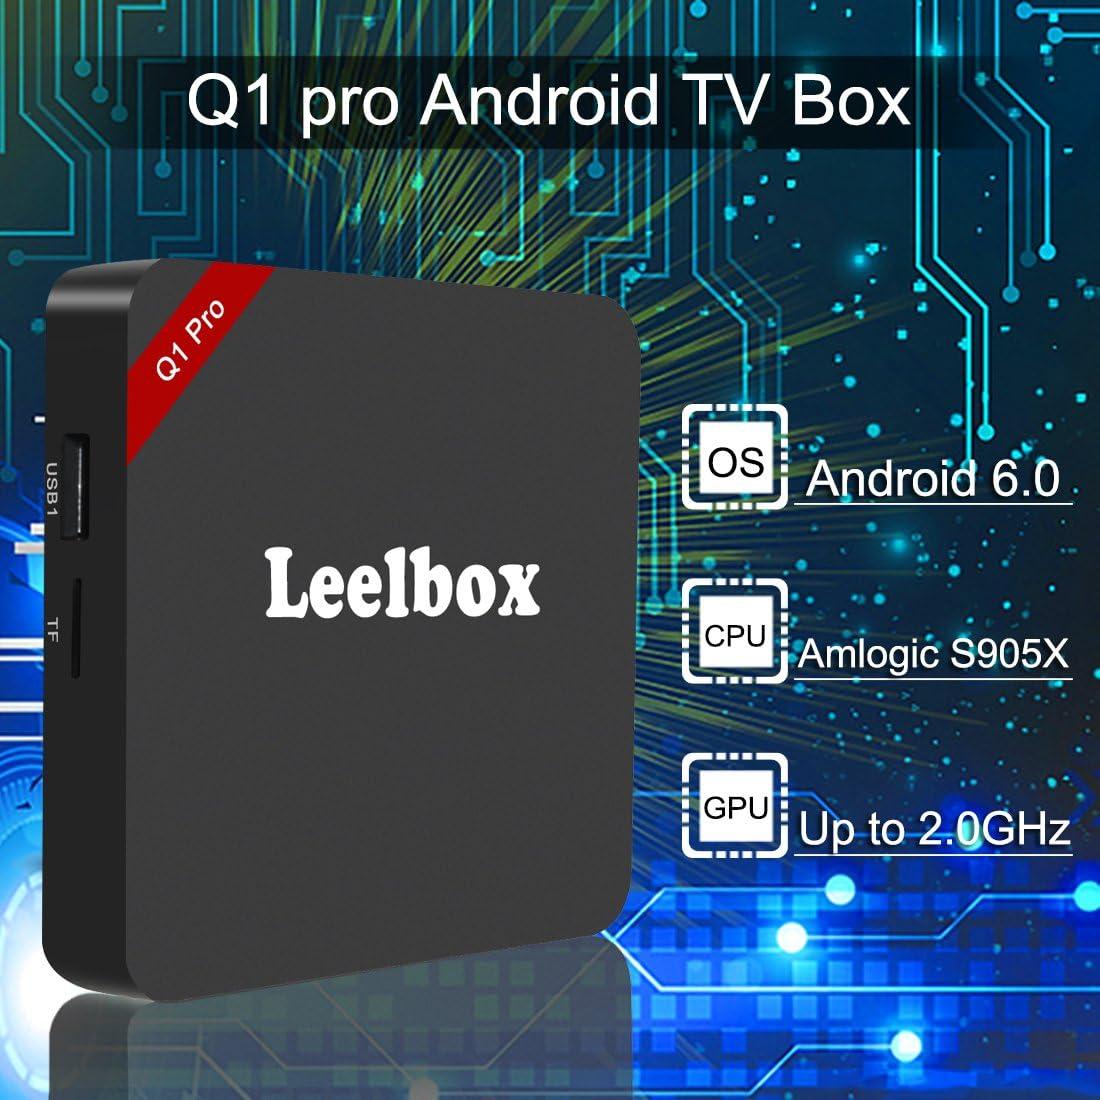 Leelbox Q1 Pro Android TV Box Smart TV Box 64 bits 2K & 4K HDMI 2.0 Quad Core Android 6.0 1 GB RAM y 8 GB Flash: Amazon.es: Electrónica